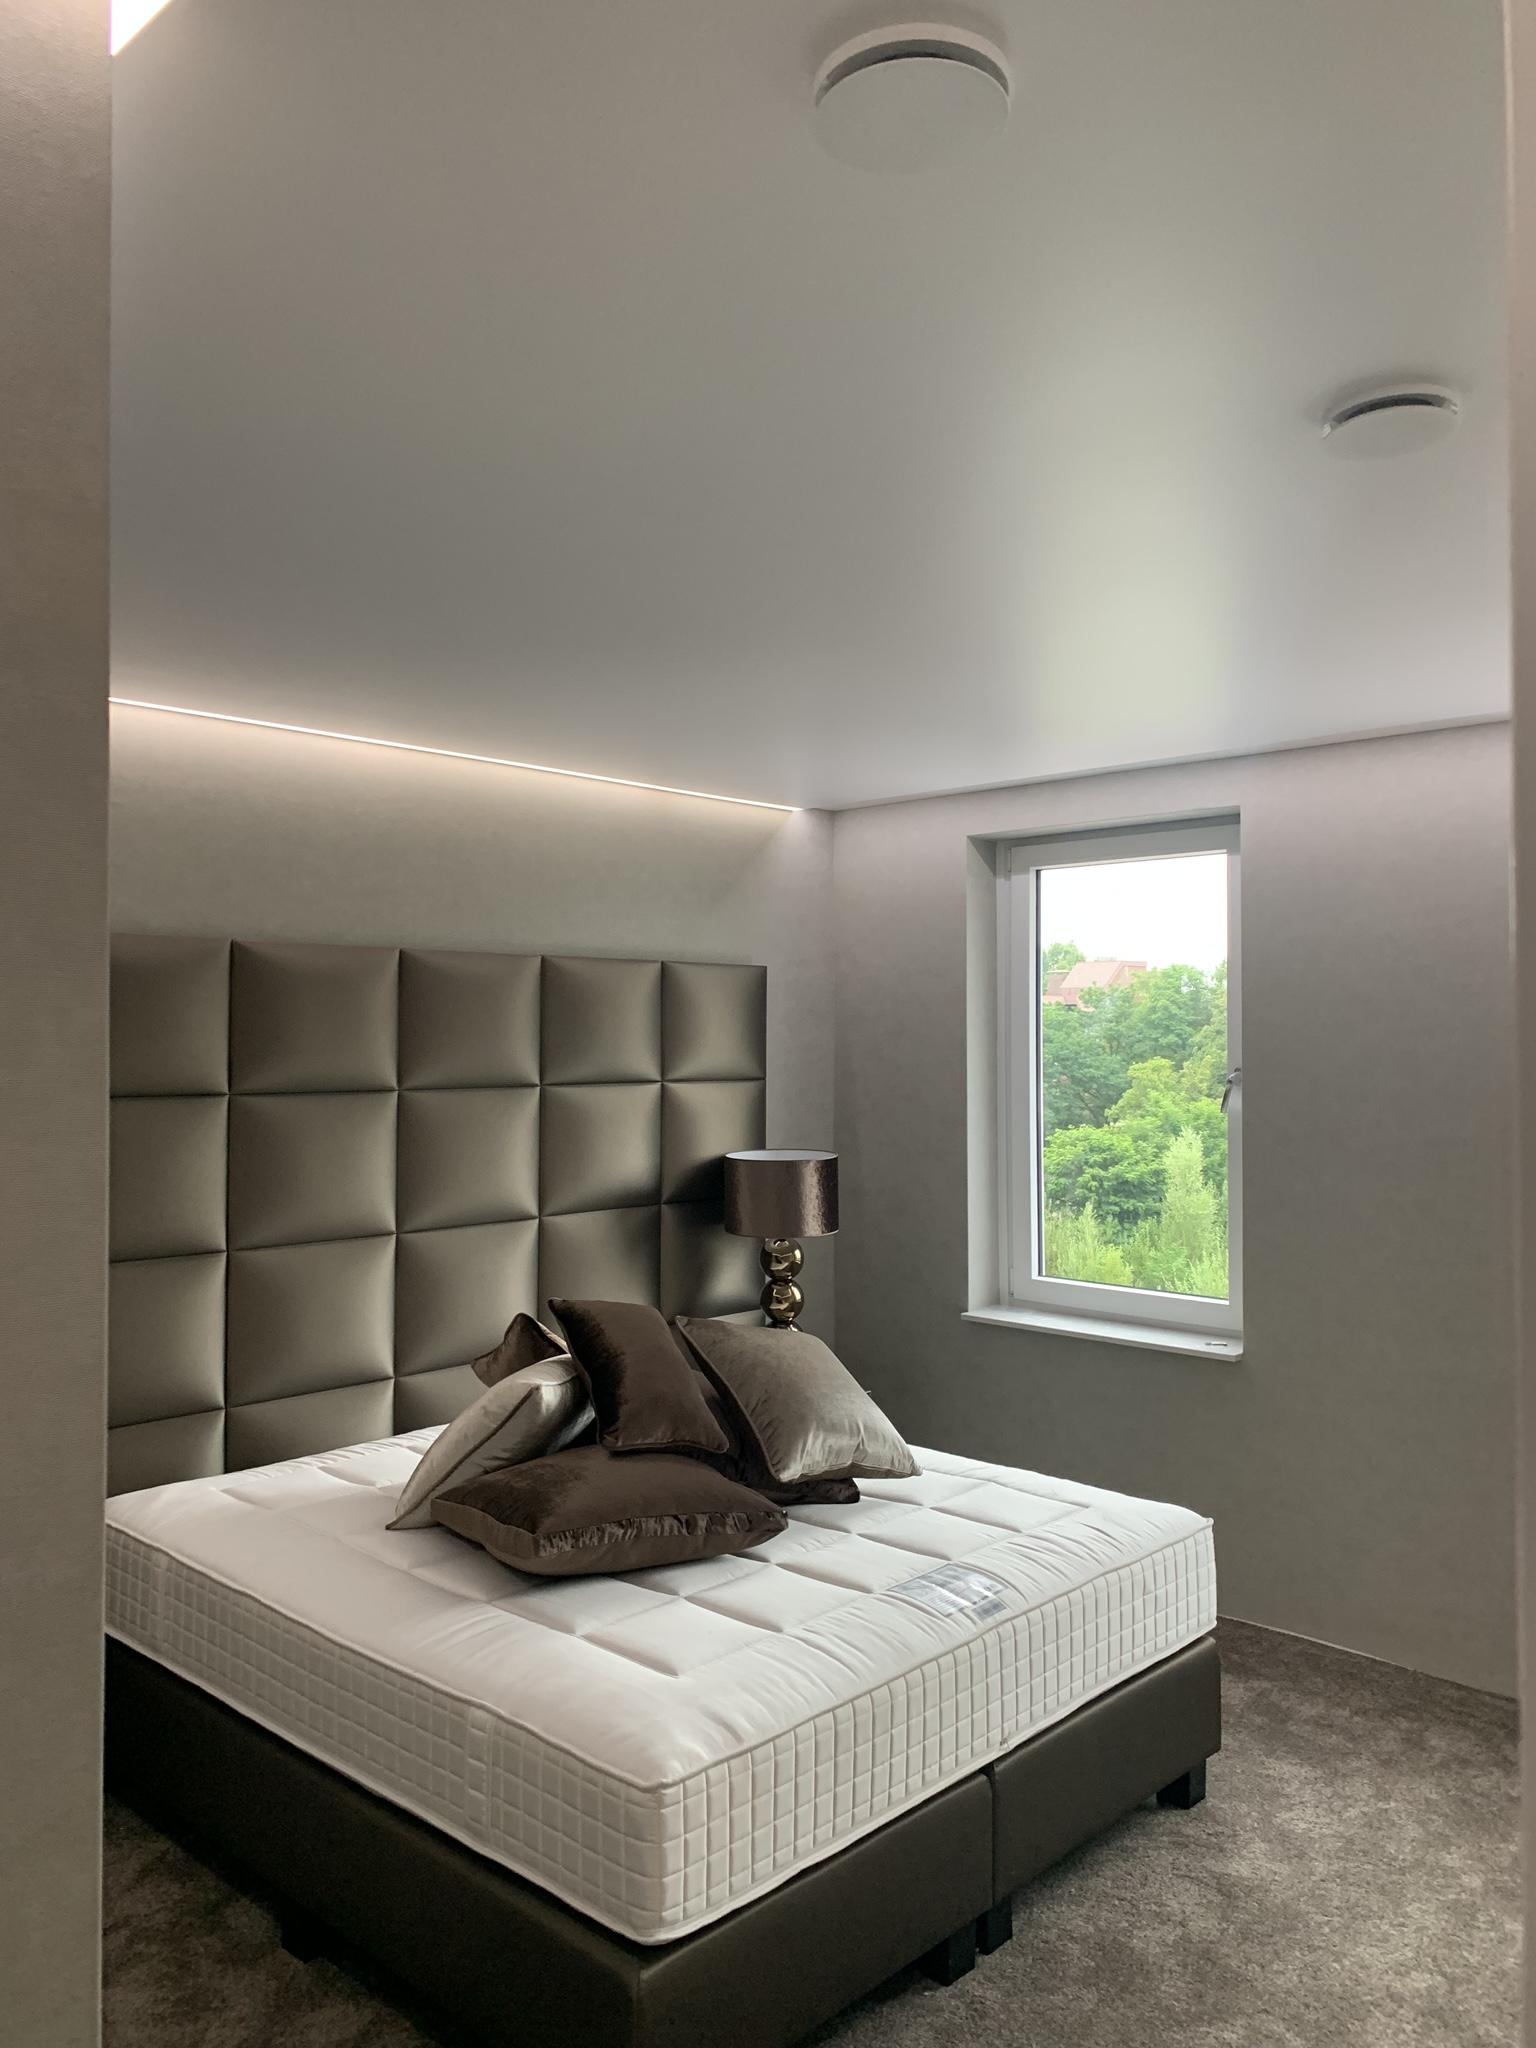 spanplafond in uw slaapkamer met rand LED verlichting